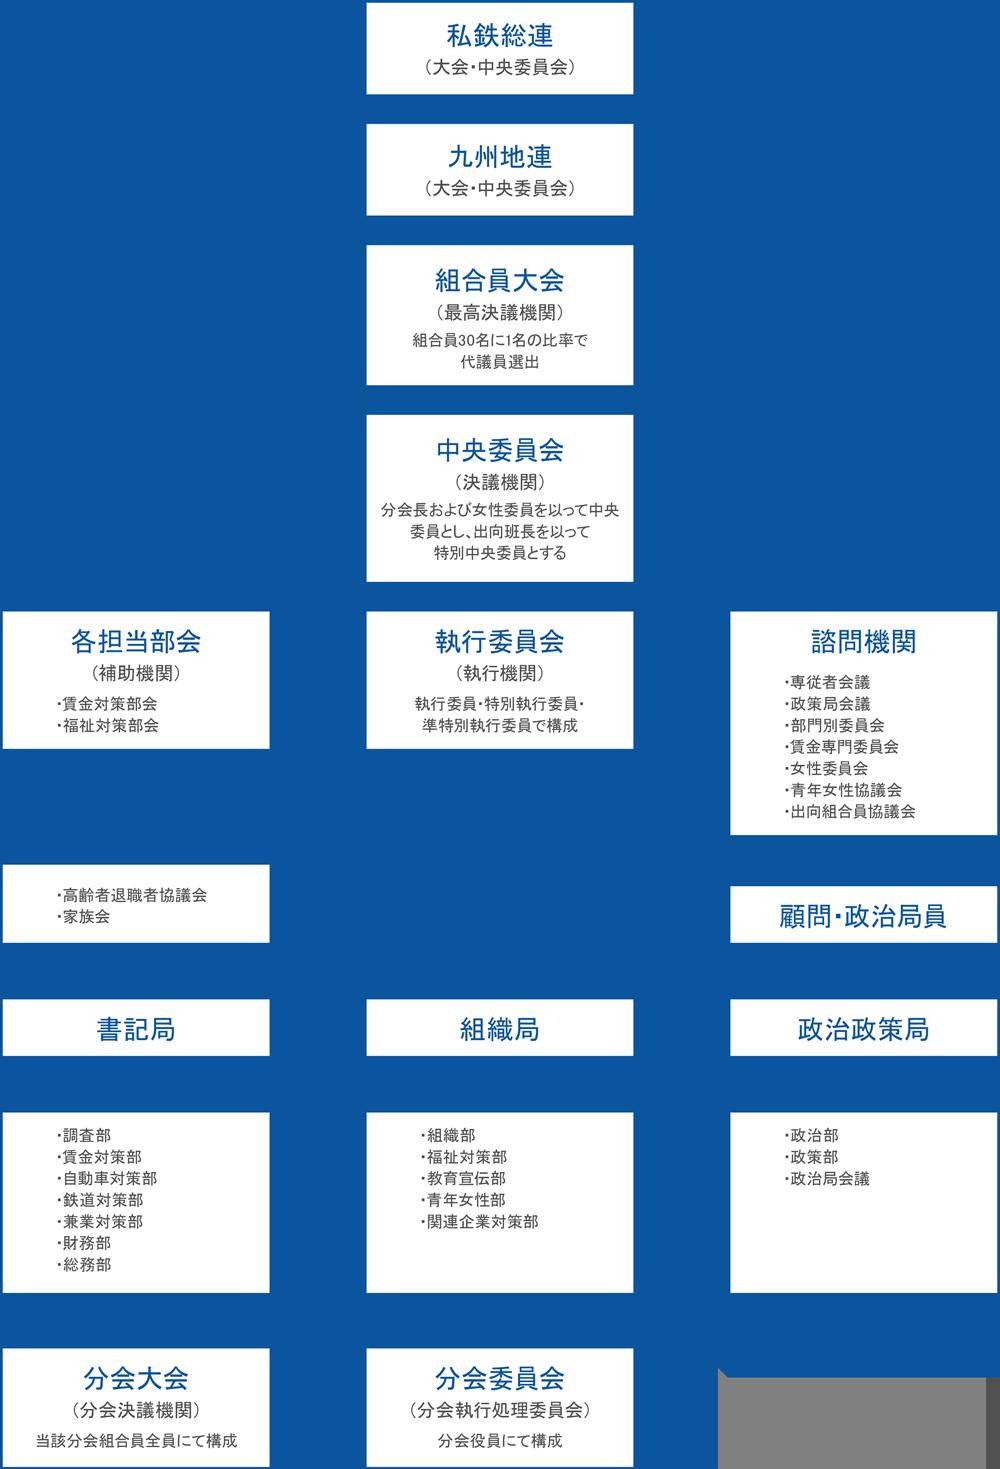 西鉄労組の機関図